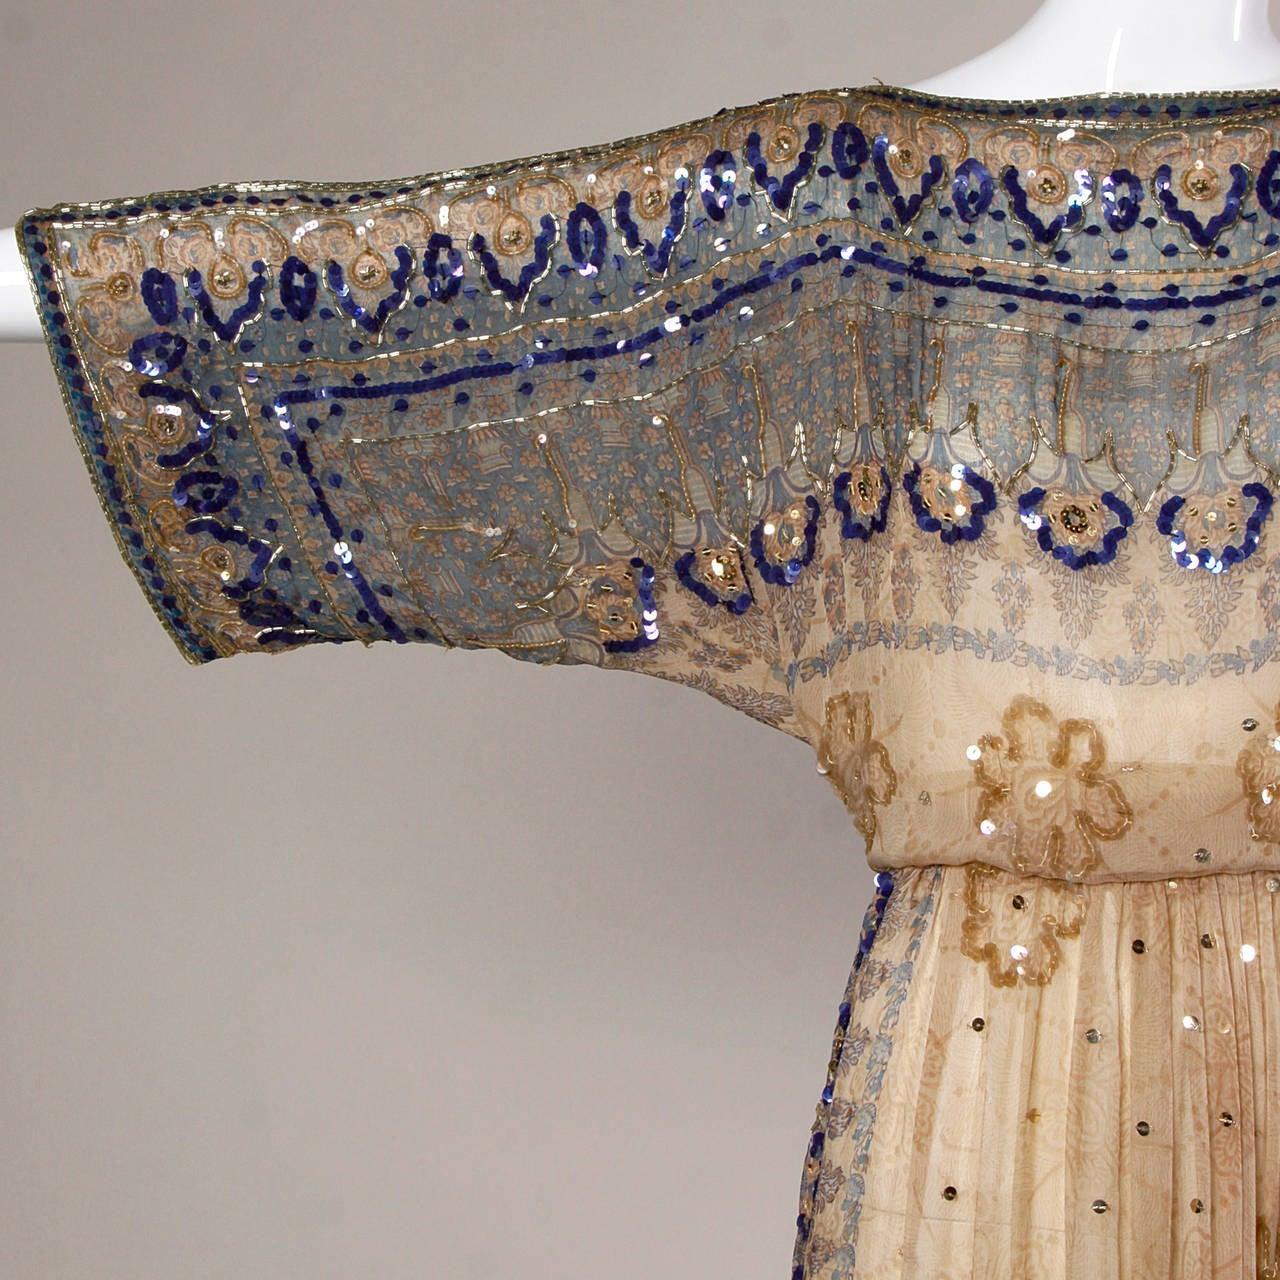 Judith Ann for Bullock's Wilshire Vintage 1970s Silk India Print Dress 3